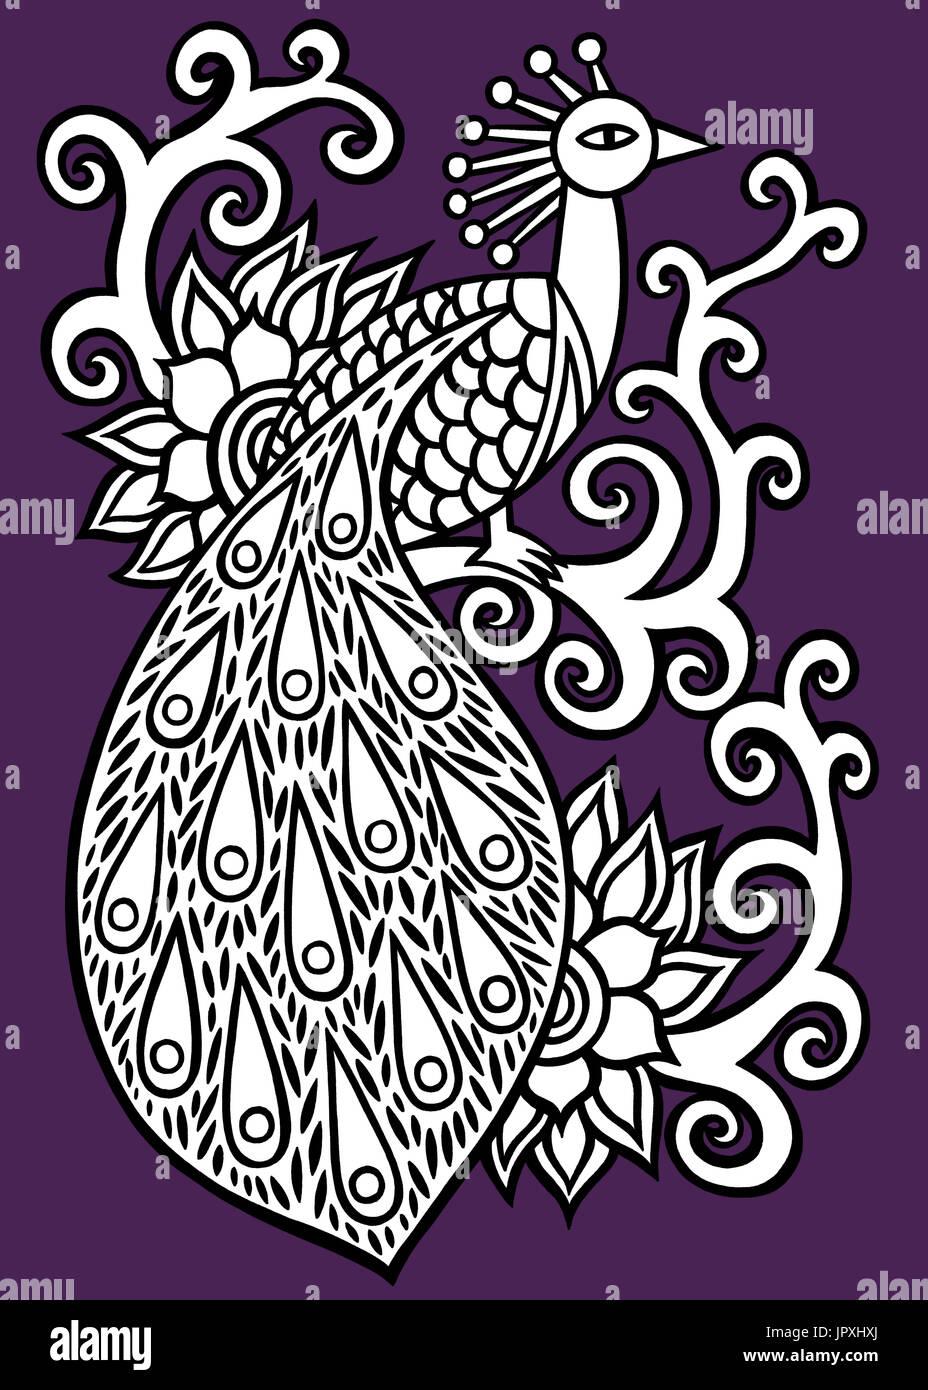 Purple peacock illustration. Stock Photo